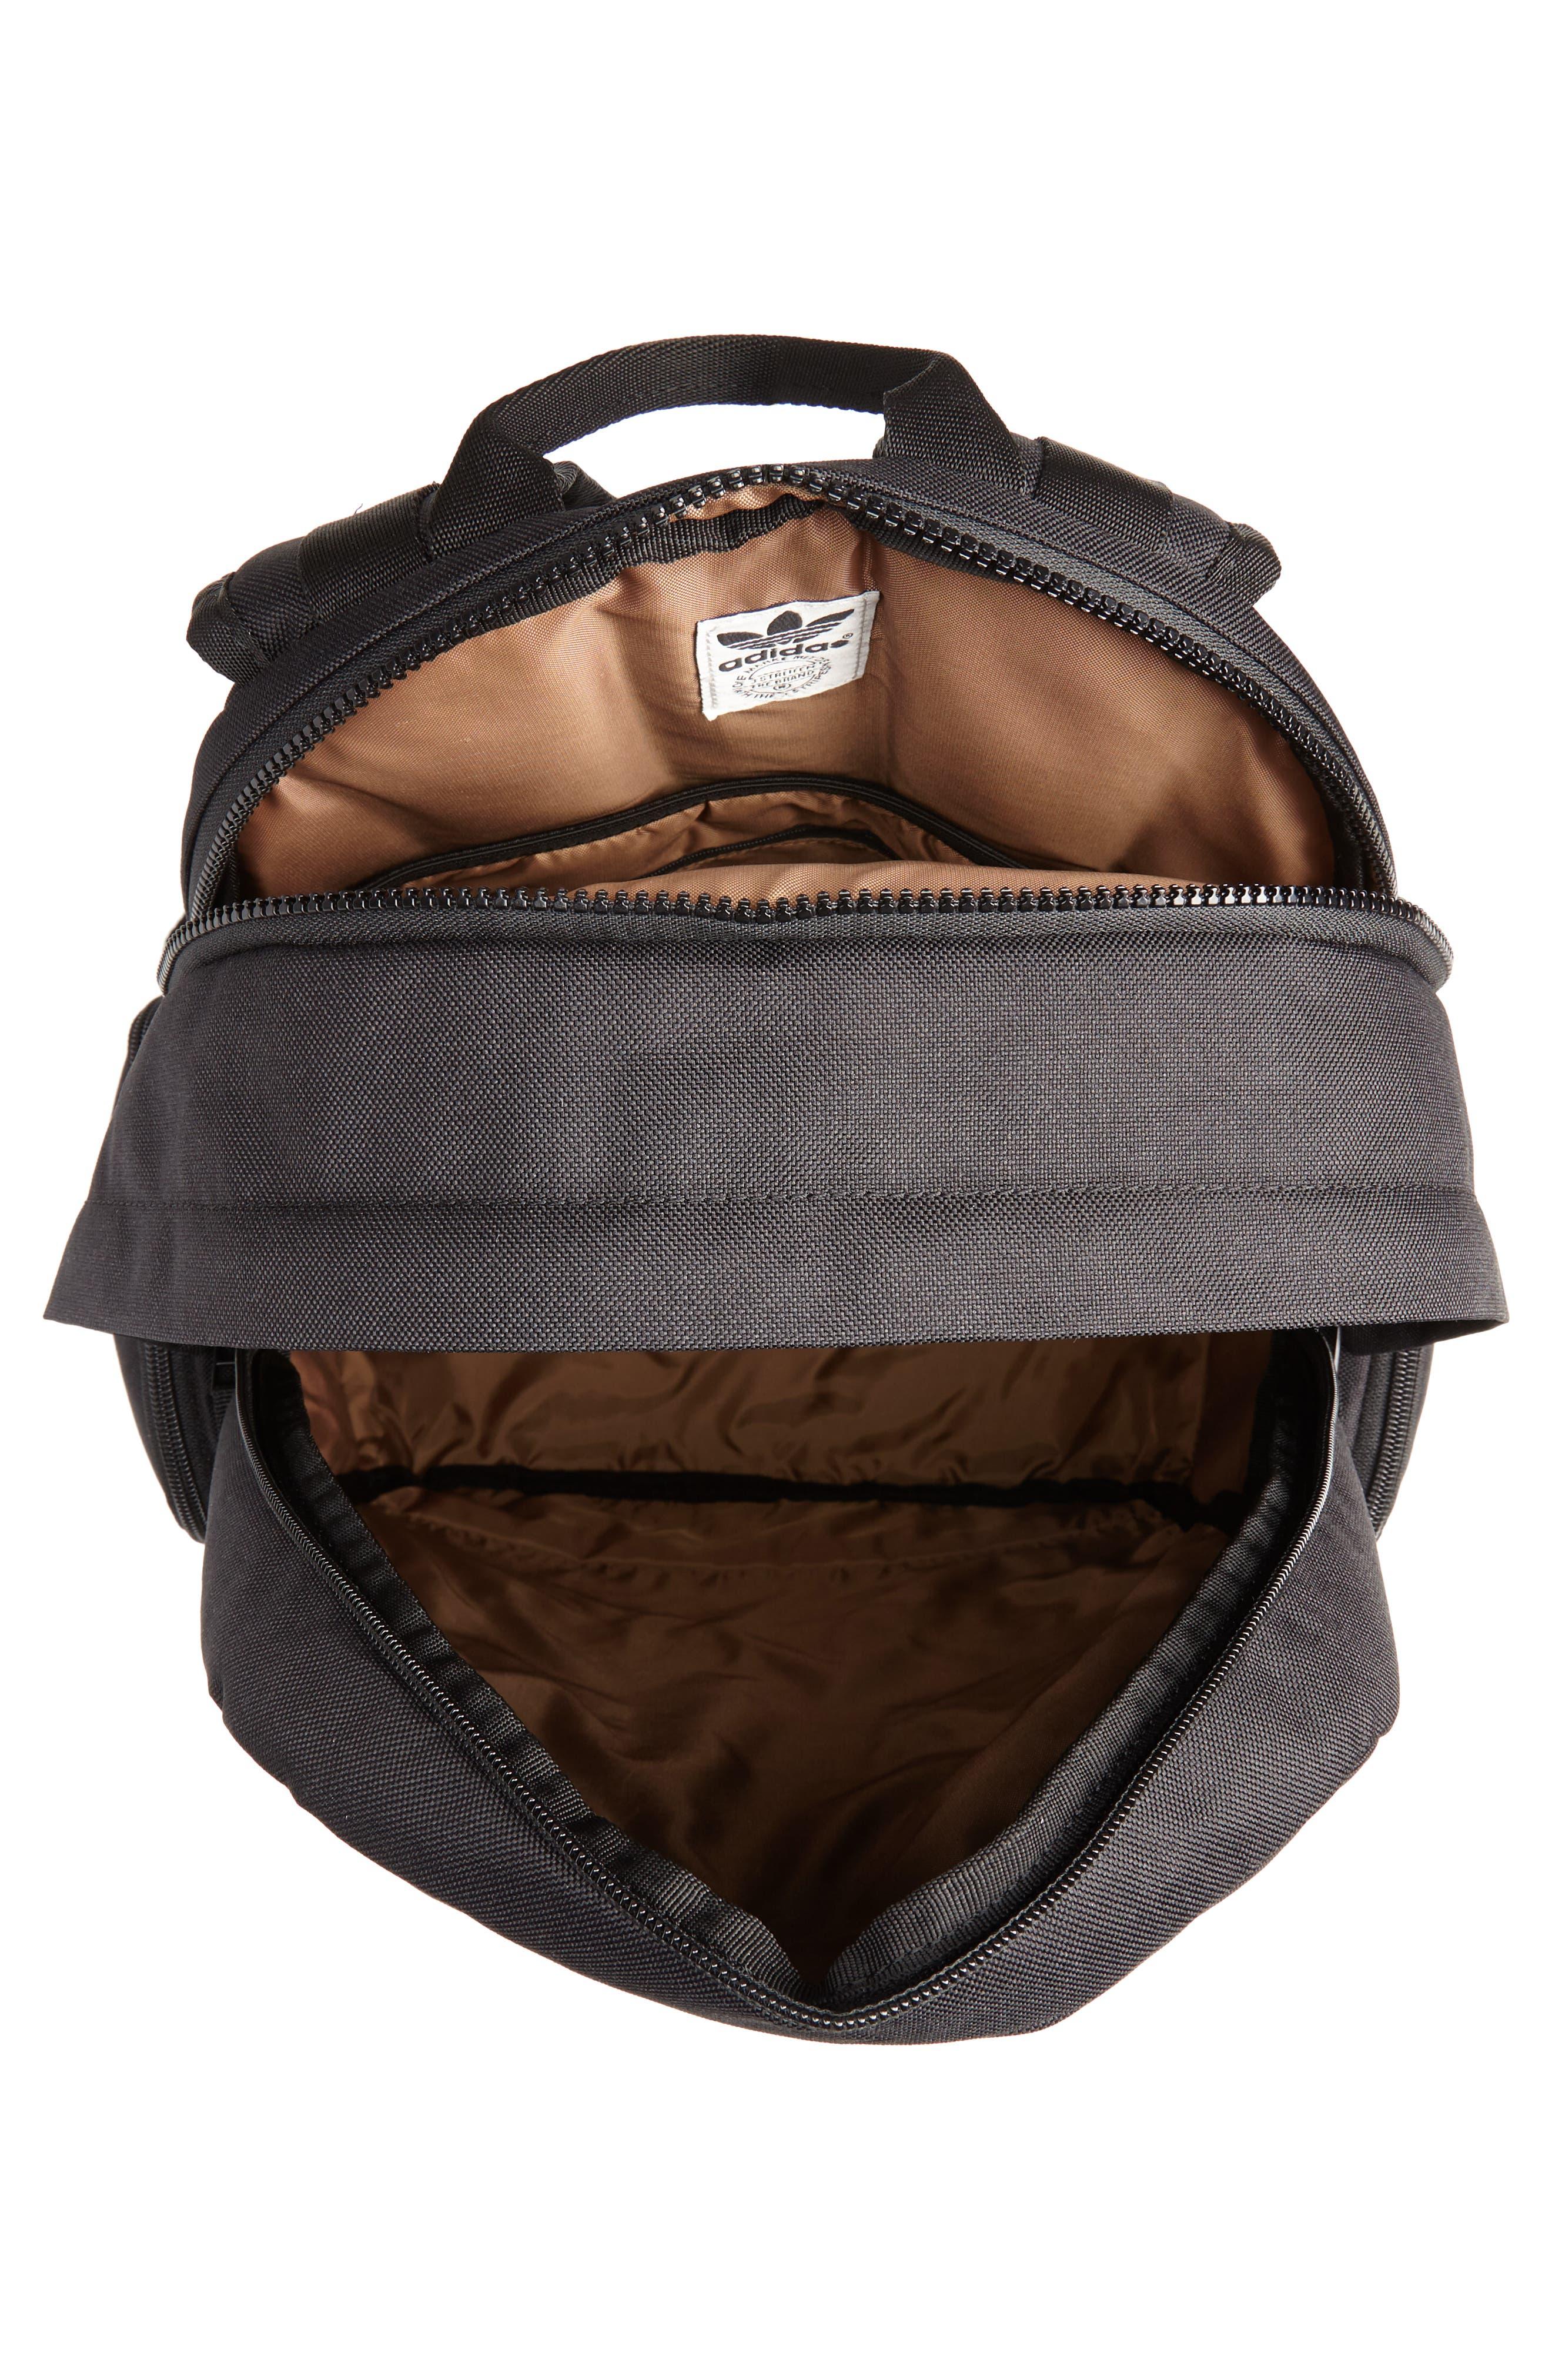 Create III Backpack,                             Alternate thumbnail 4, color,                             BLACK/ RAW DESERT KHAKI